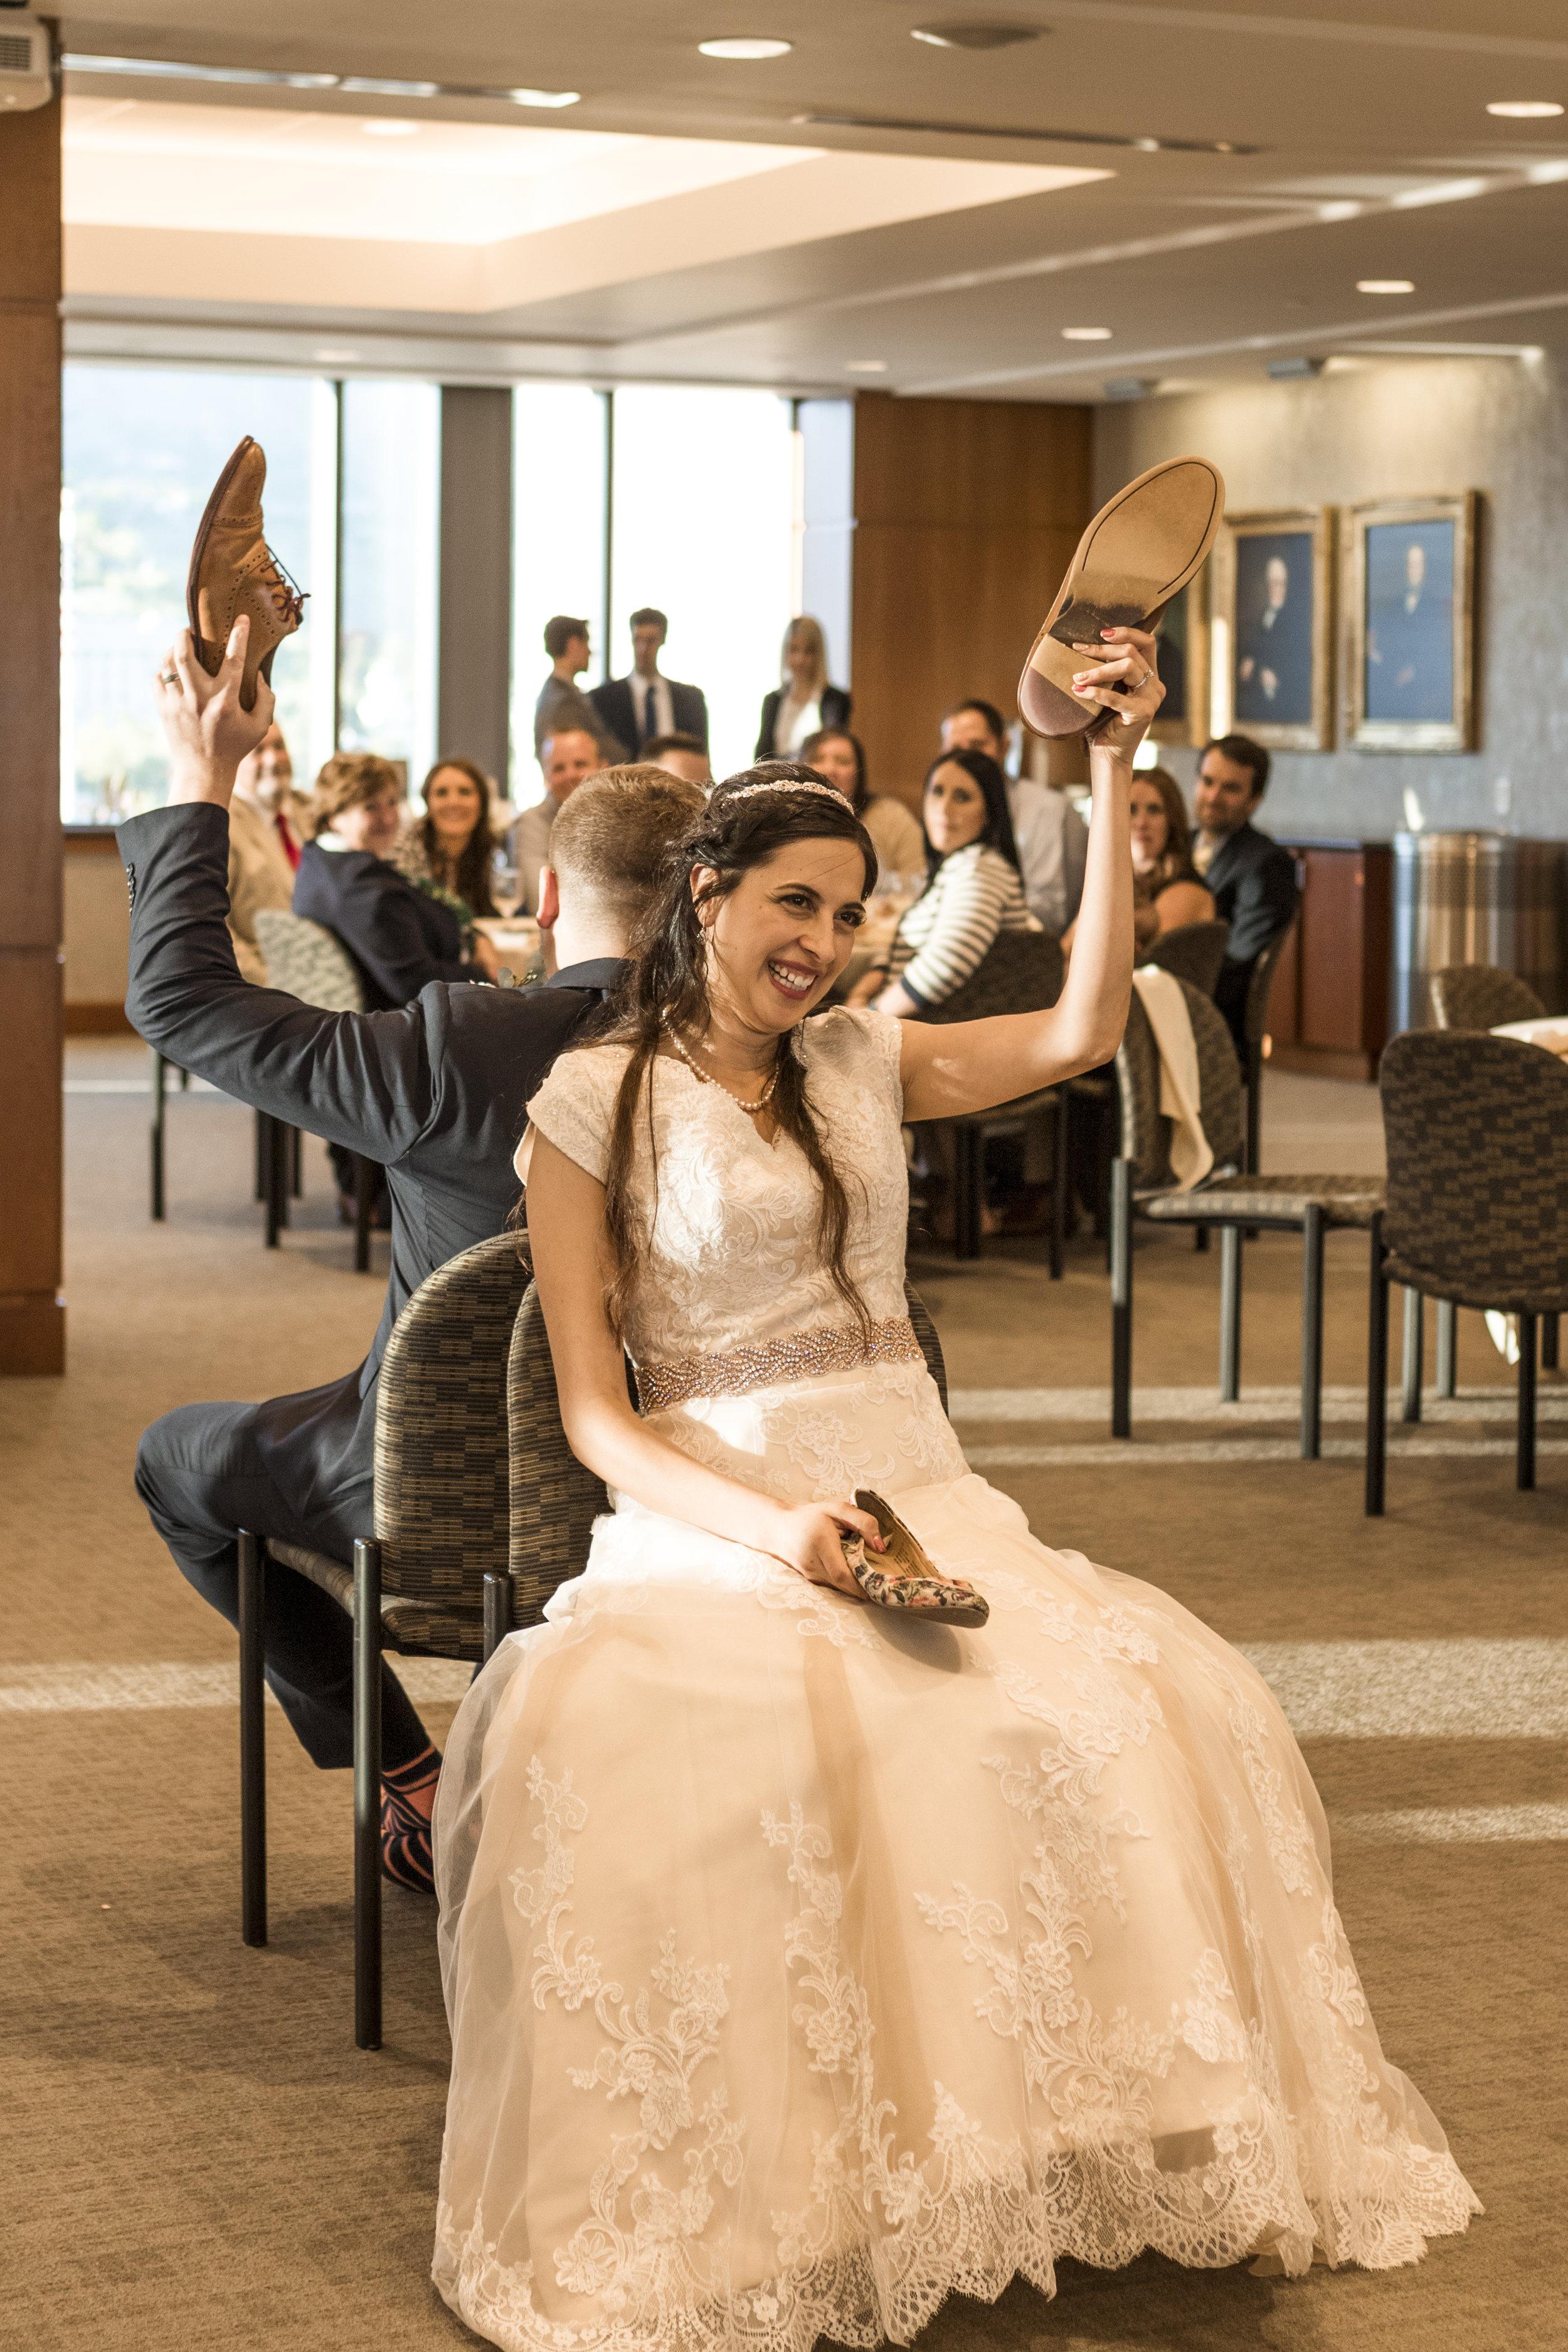 Utah Spring Wedding Reception in the Zions Bank Founders Room by Bri Bergman Photography18.JPG